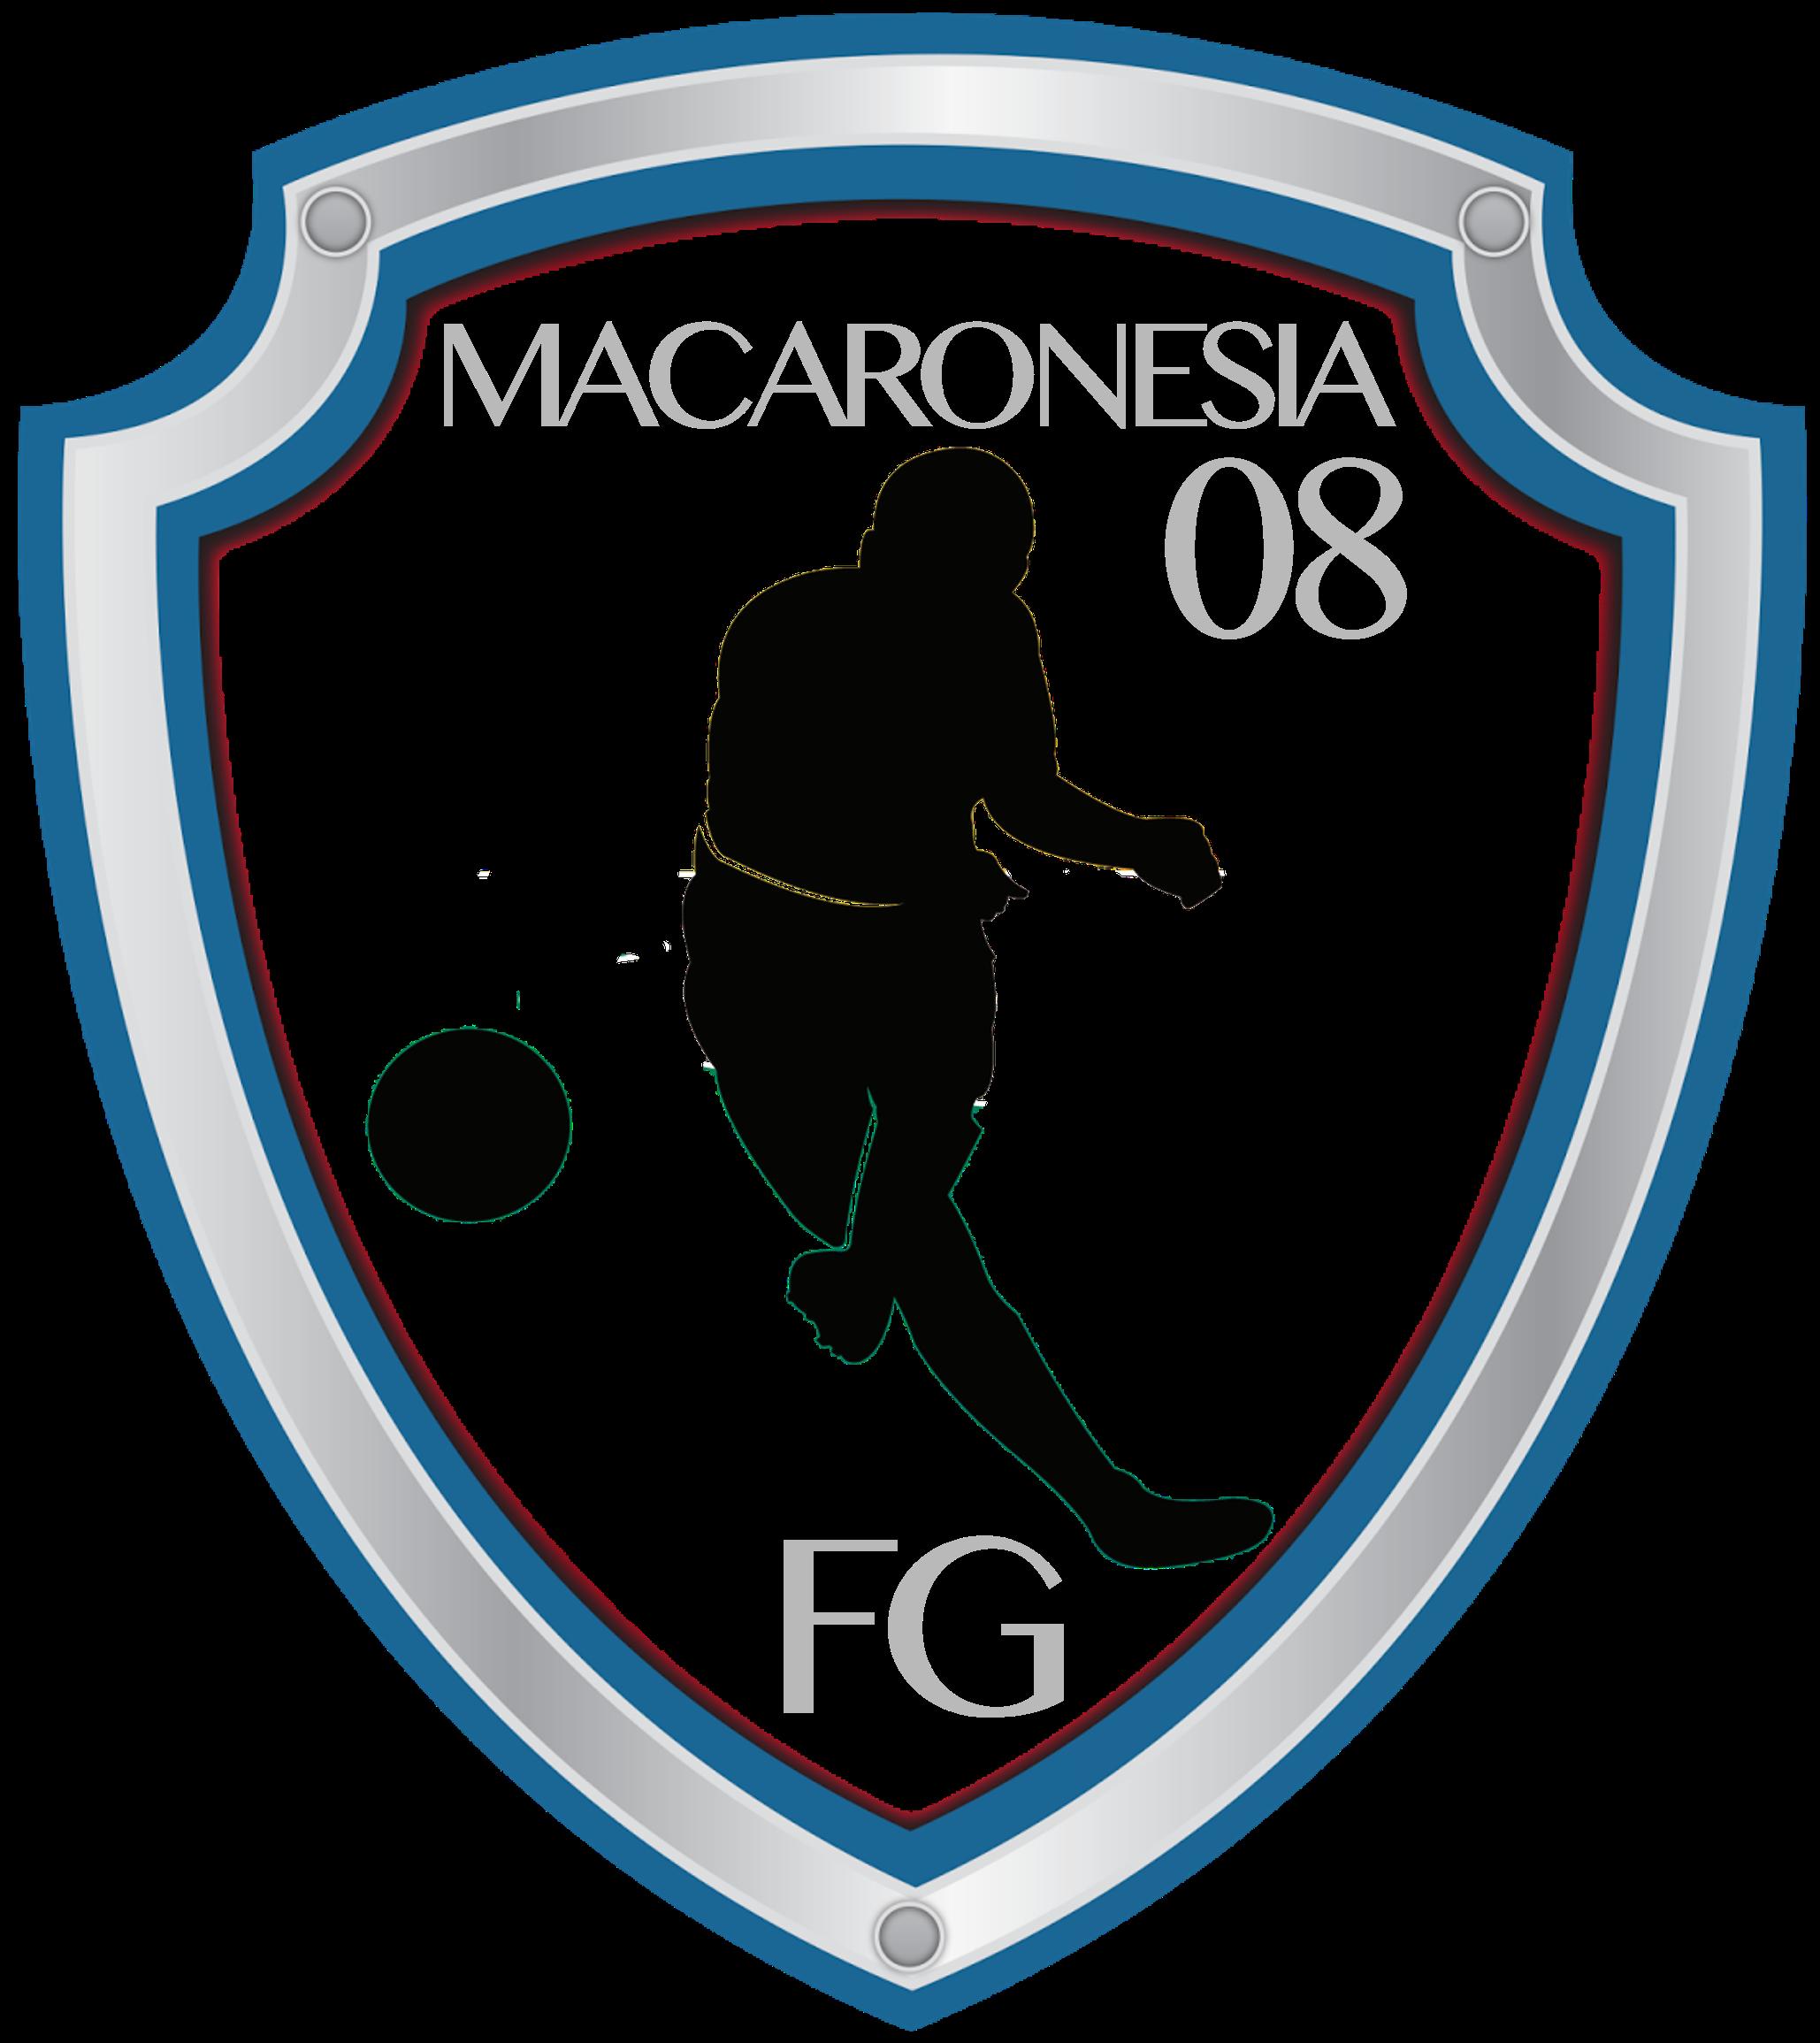 macaronesia08